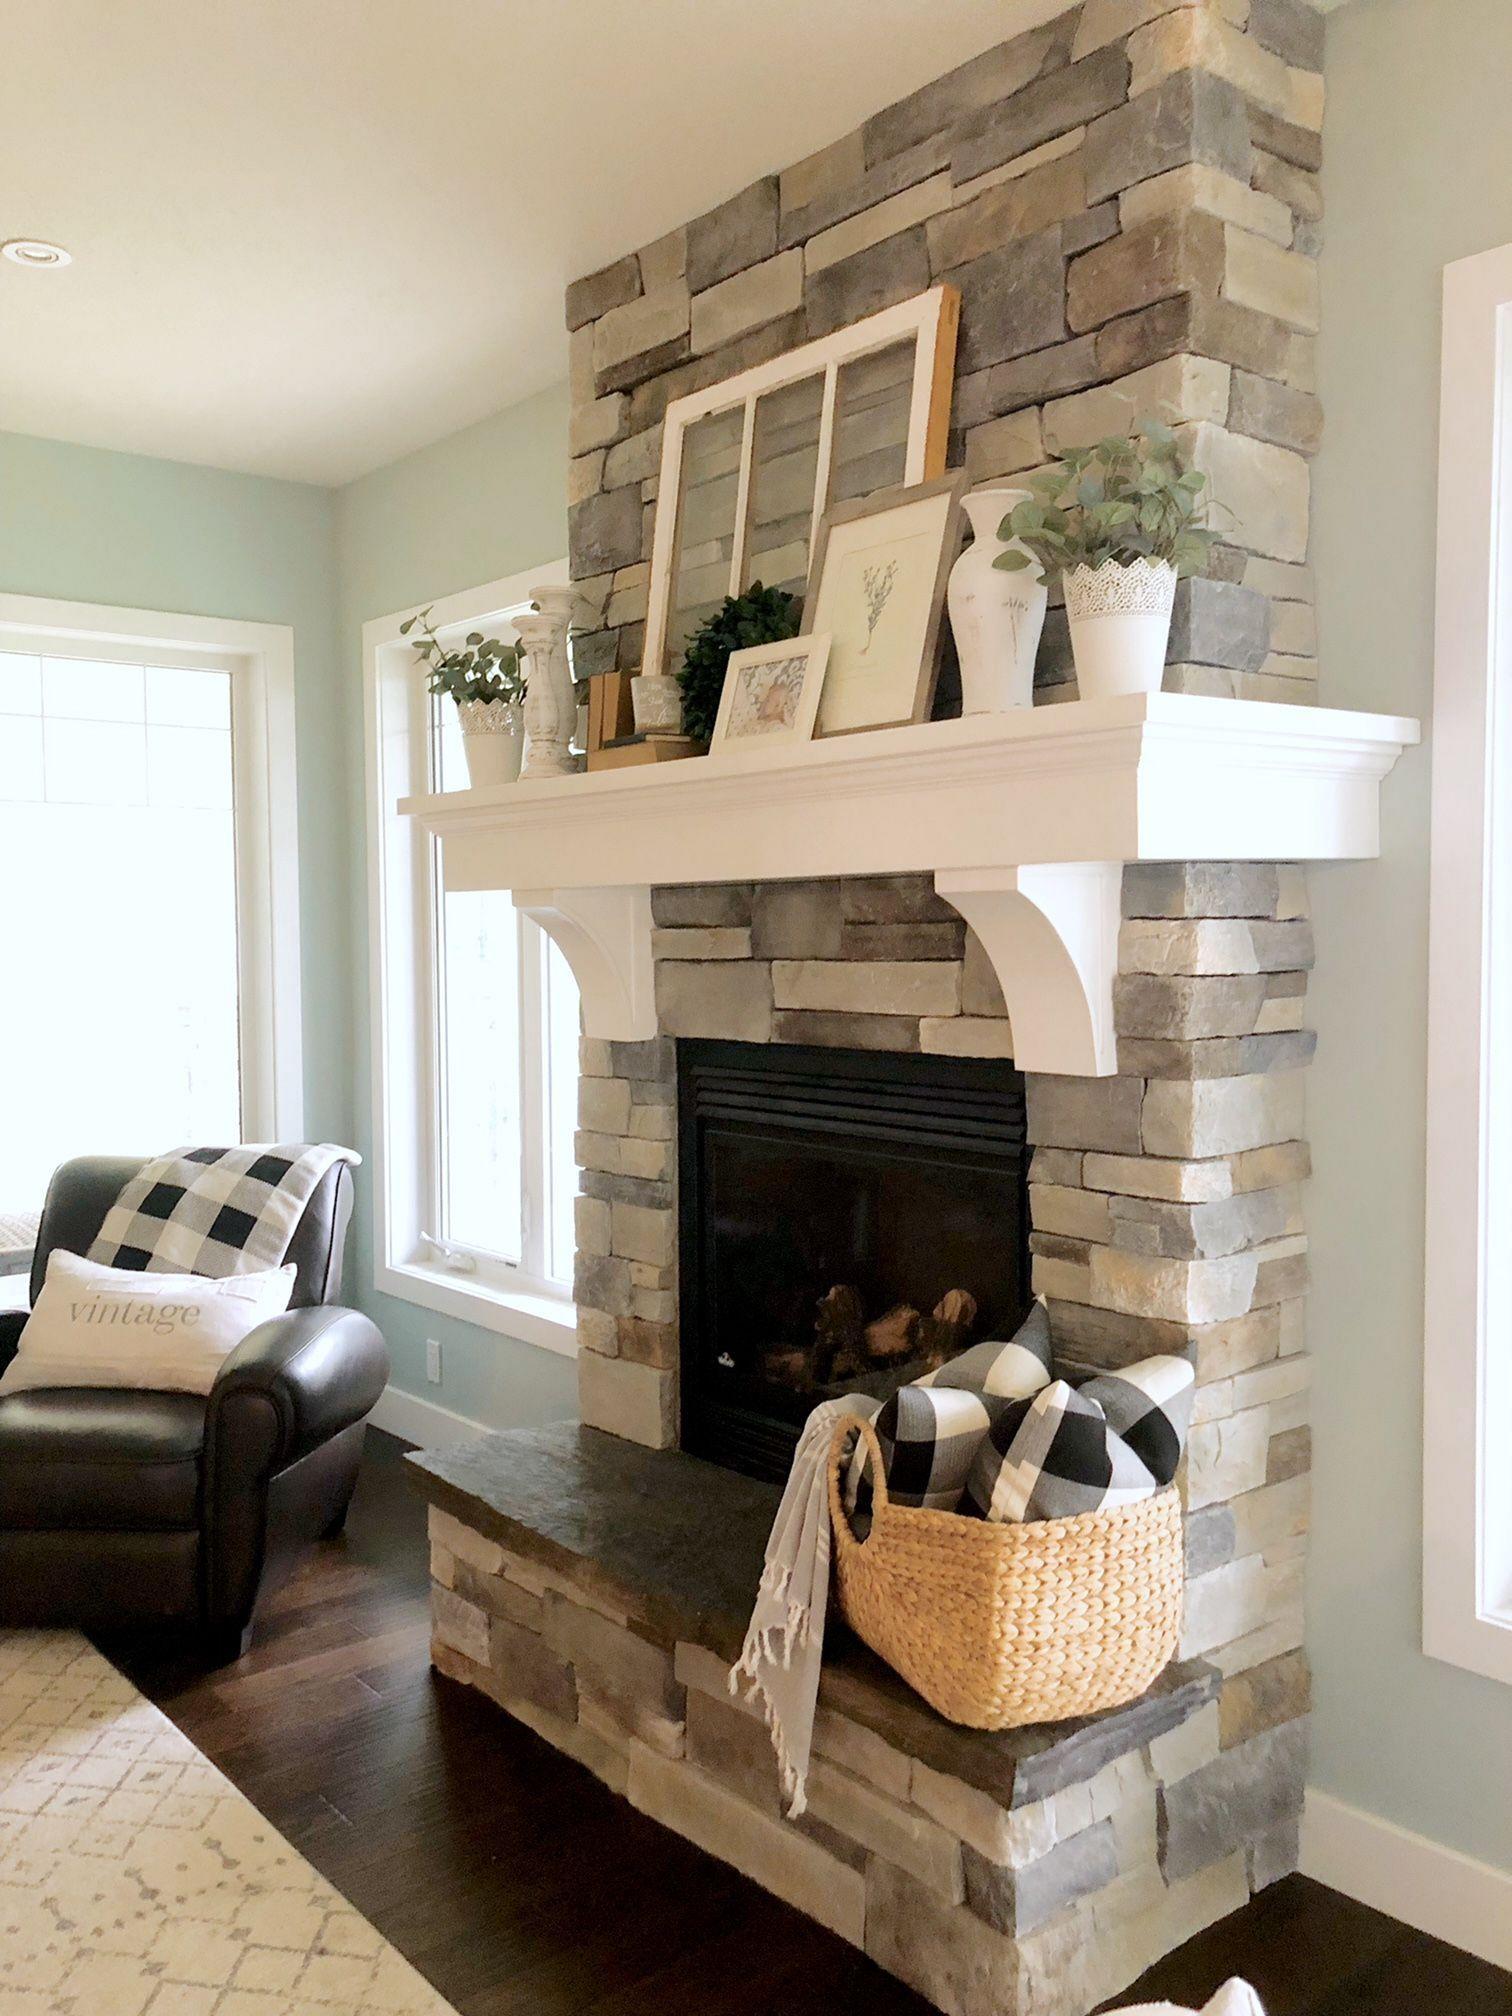 10 beautiful farmhouse fireplace mantel decorations that